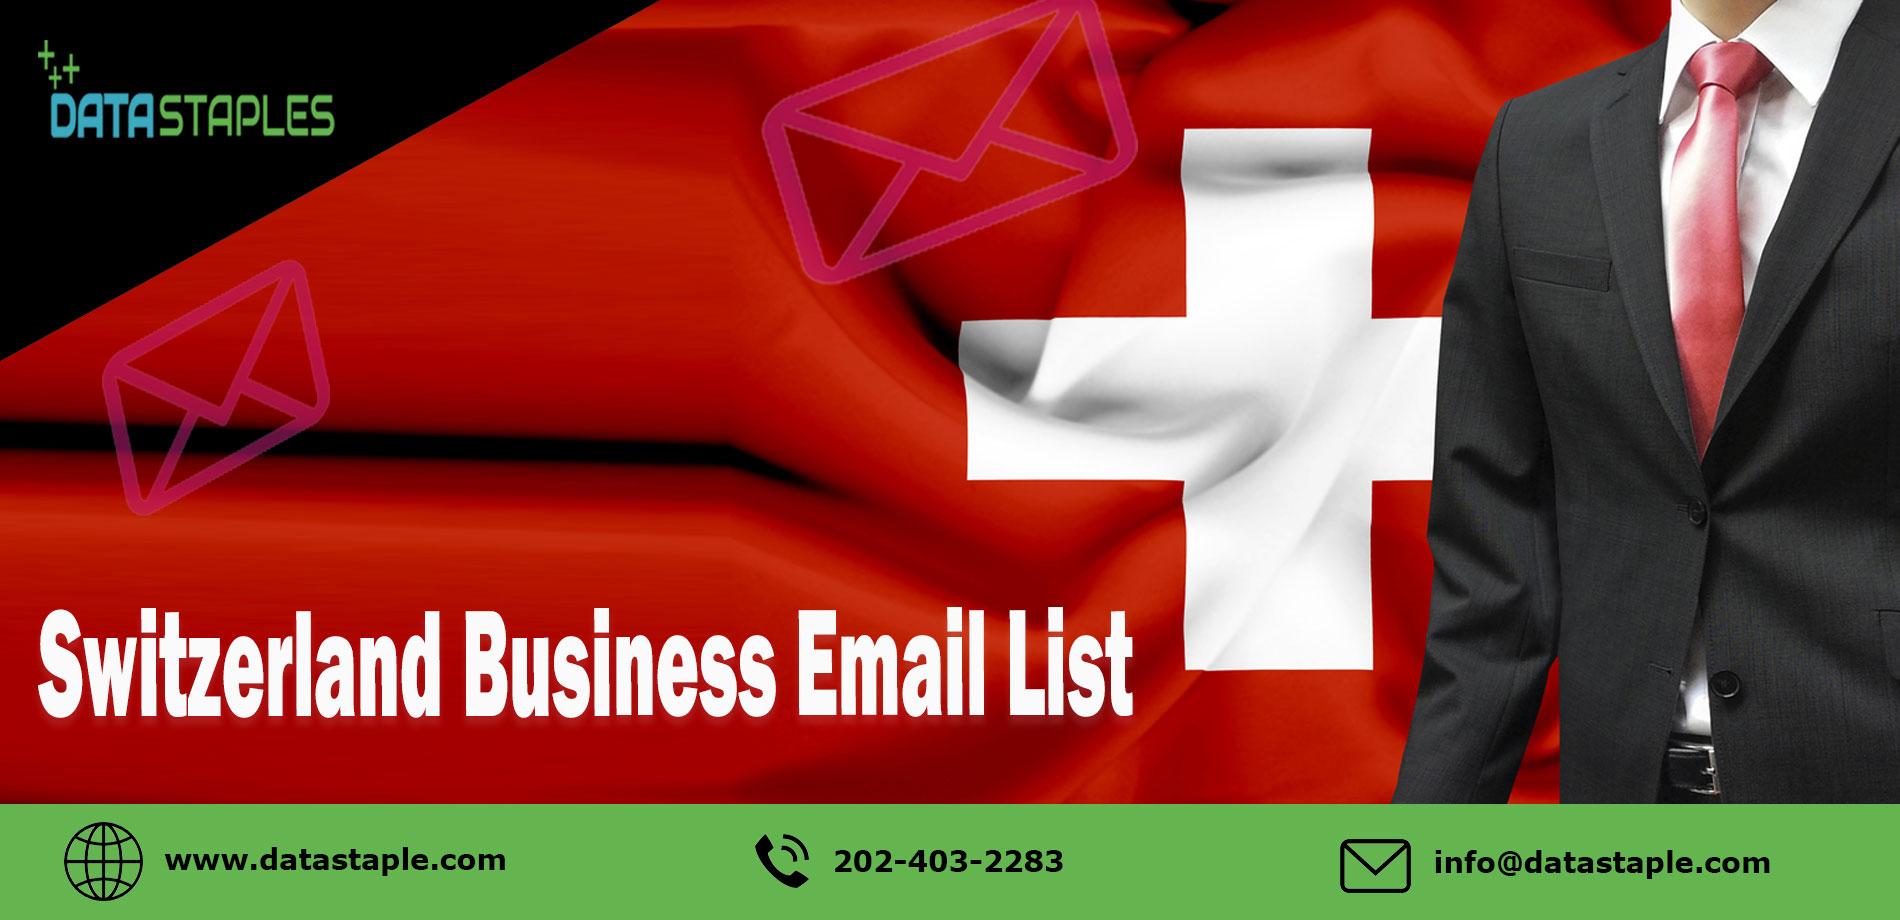 Switzerland Business Email List | DataStaples